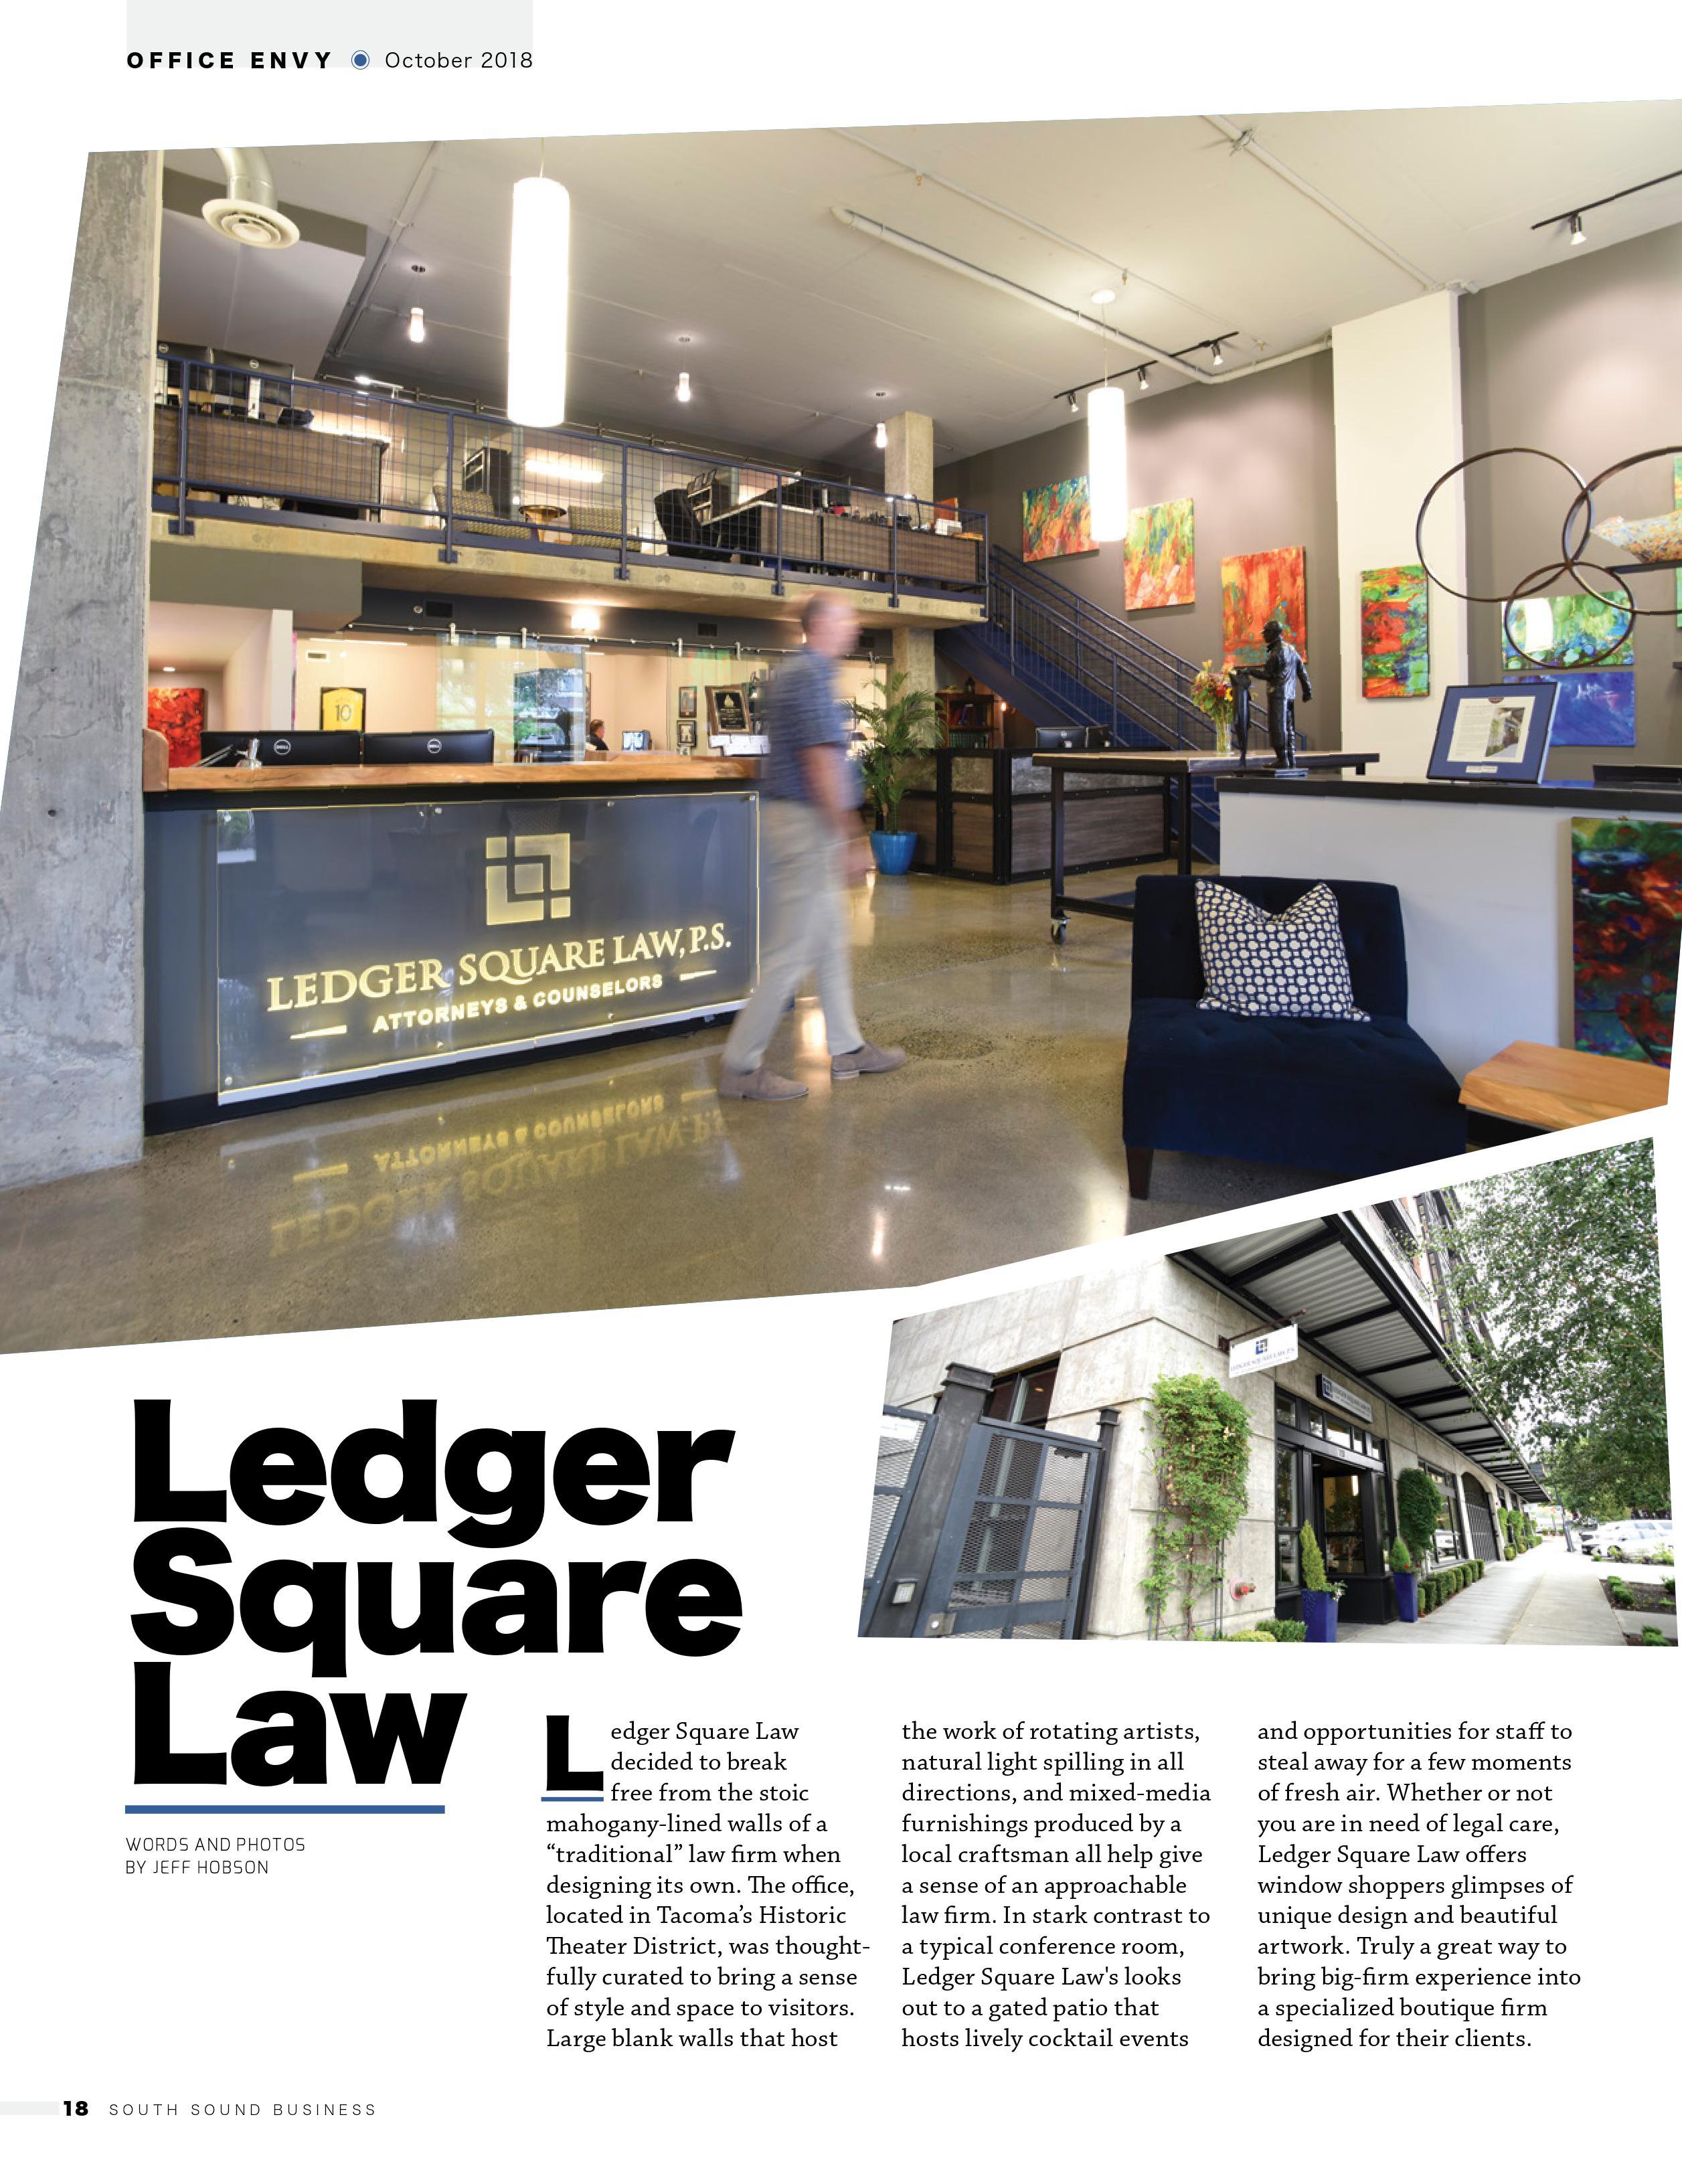 Ledger Square Law